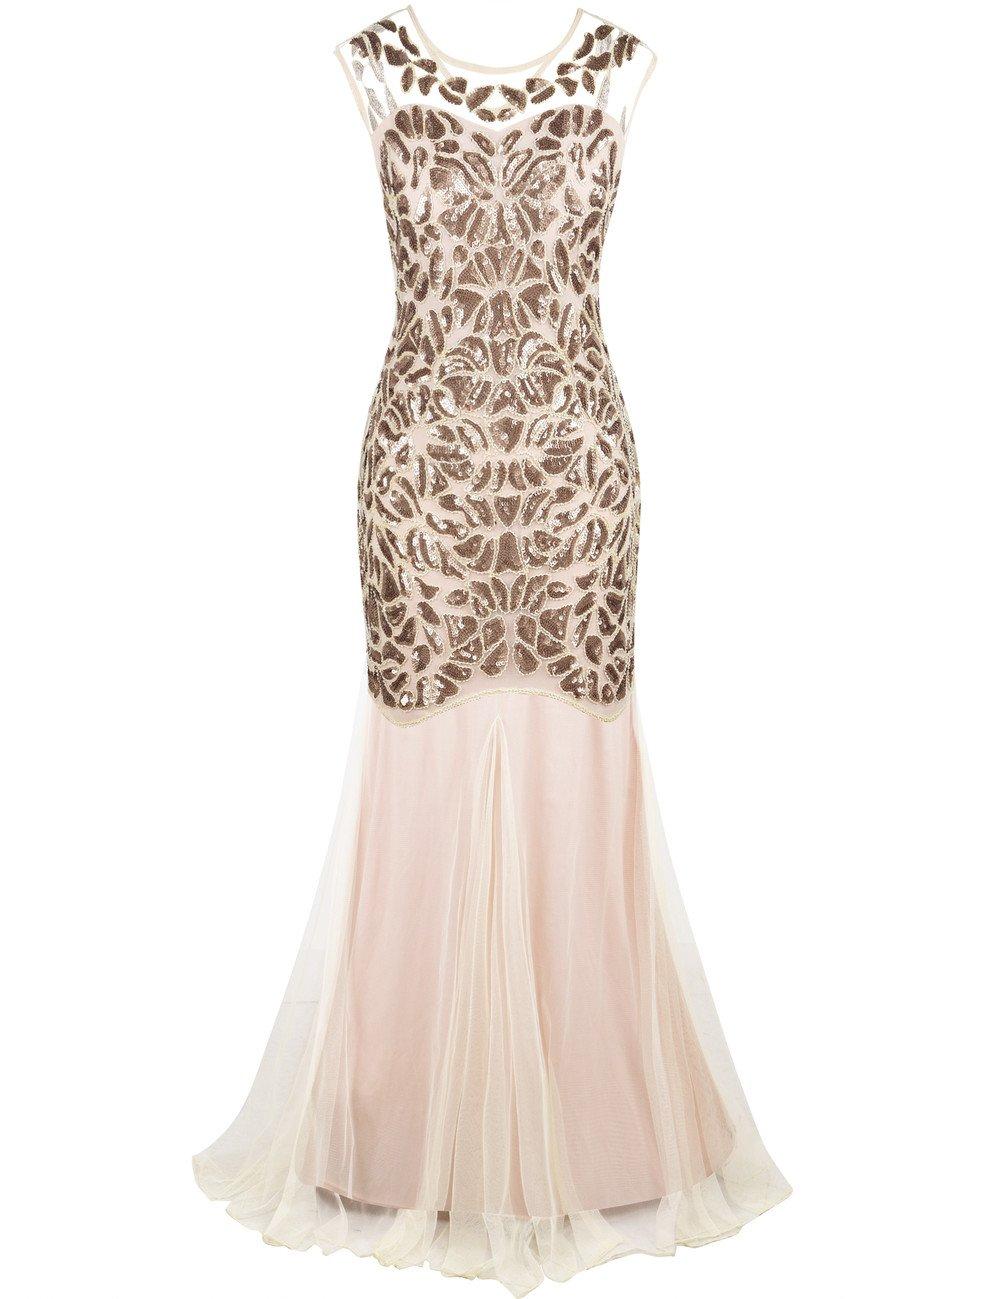 PrettyGuide Women's 1920s Art Deco Flapper Formal Gowns Cocktail Evening Dress M Champange